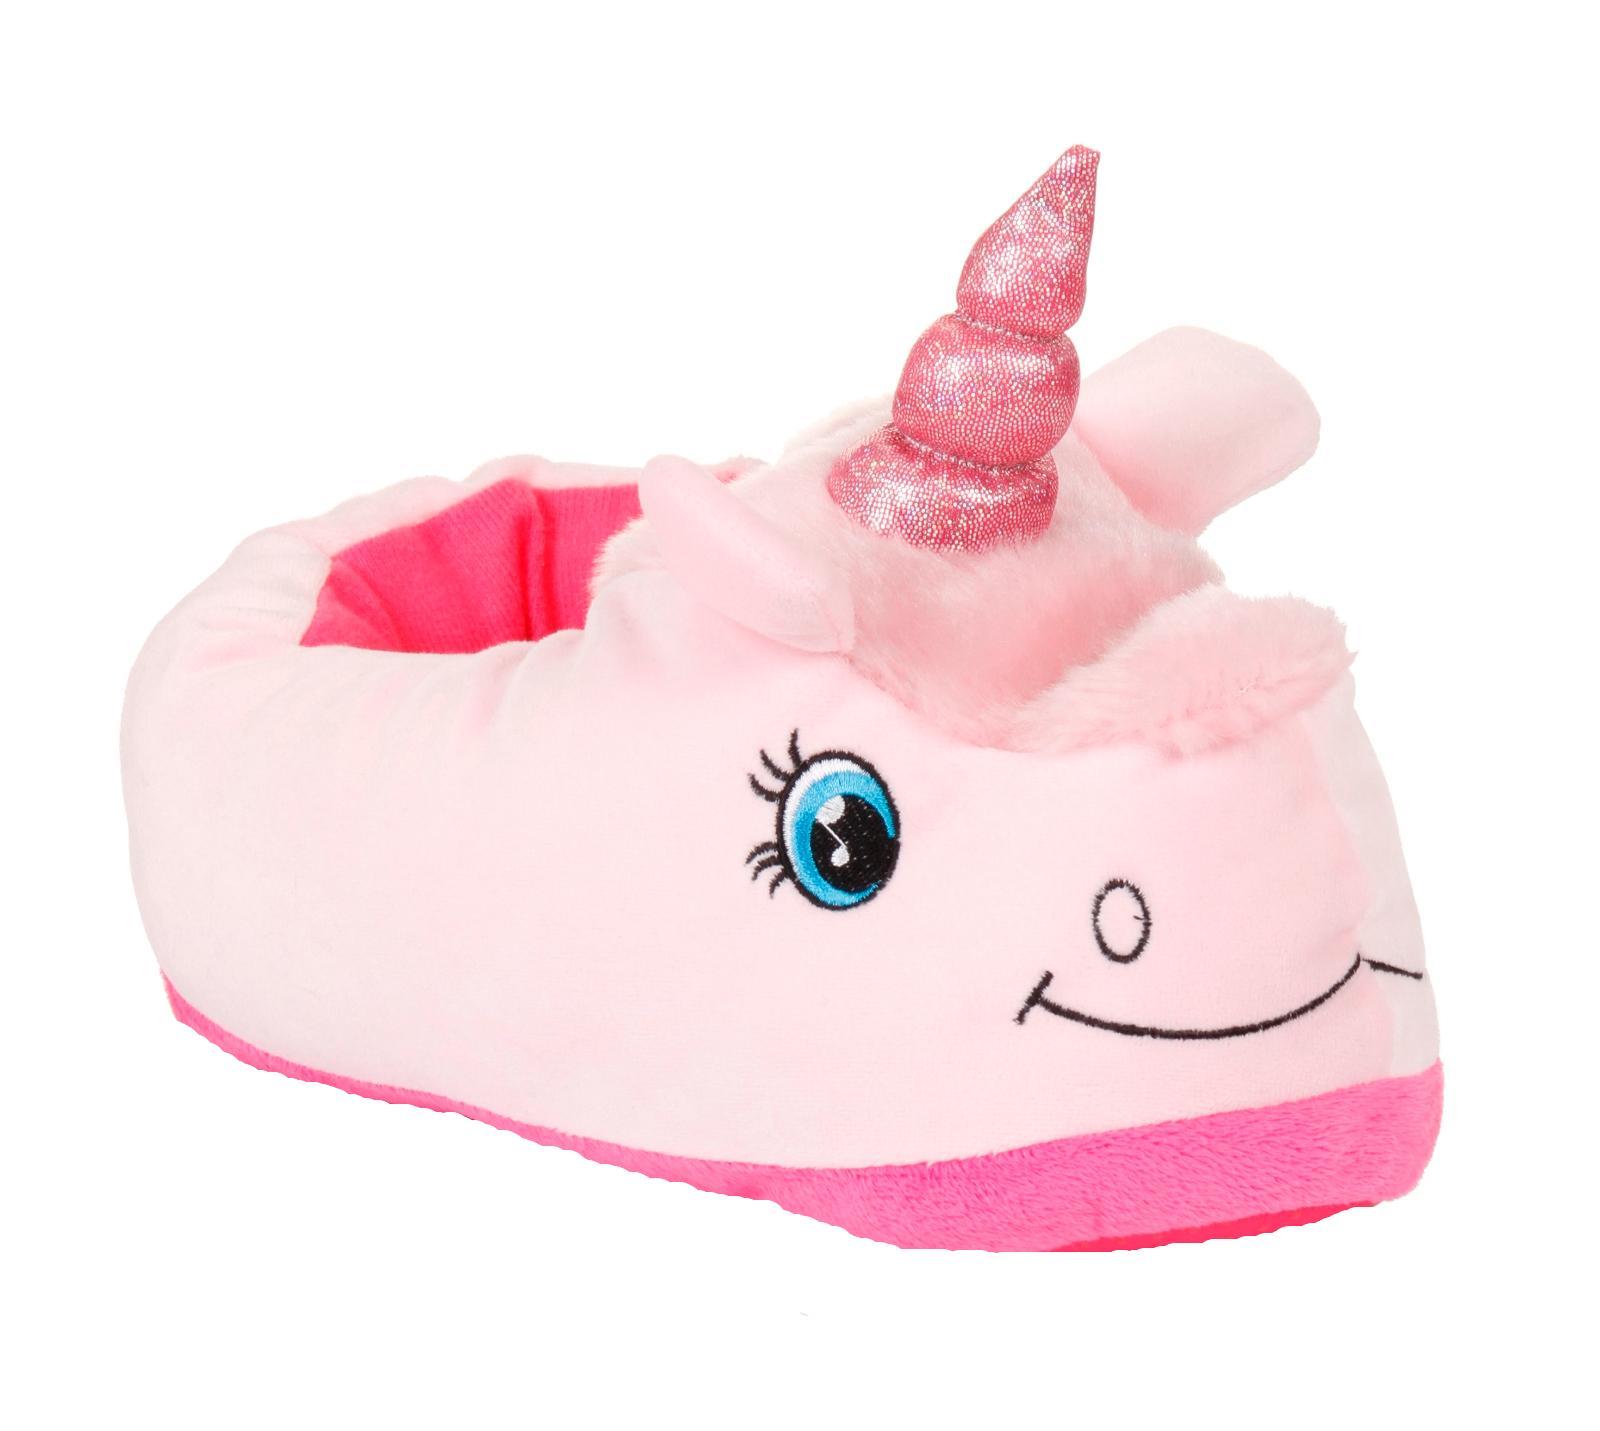 ce67440ae265 Womens Girls Novelty 3D Character Plush Unicorn Slippers Ladies Gift Size 10 -UK8